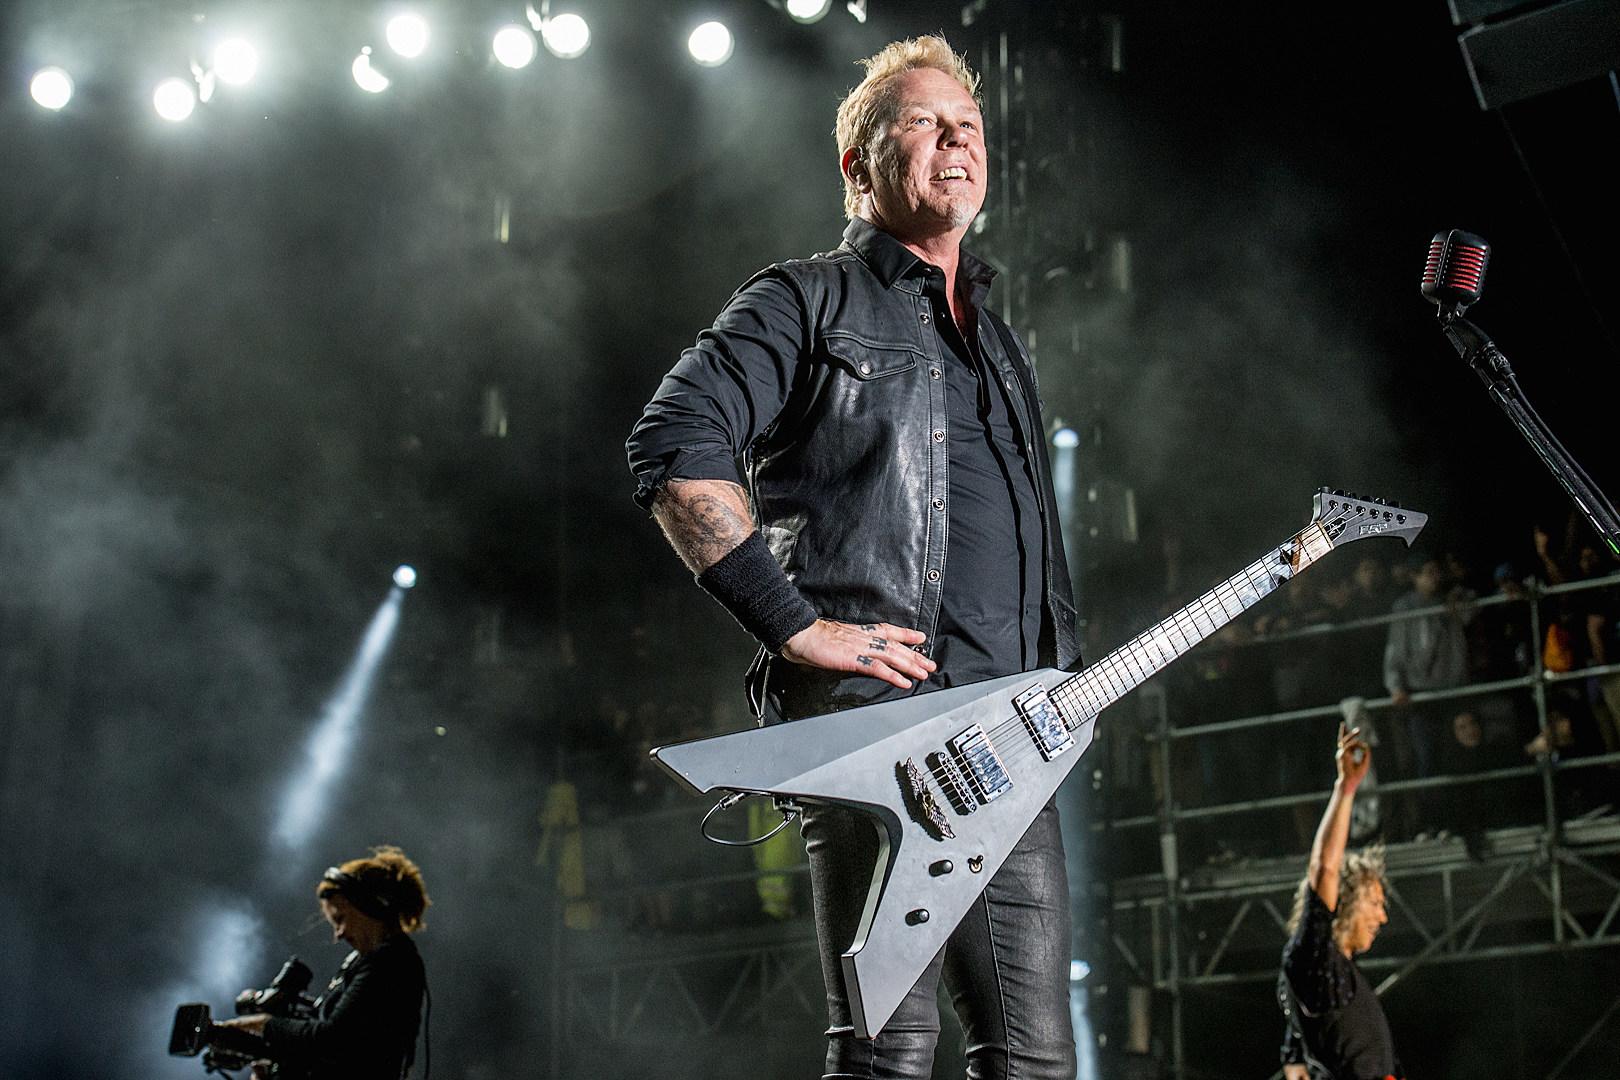 Секс и стиль музыки металика